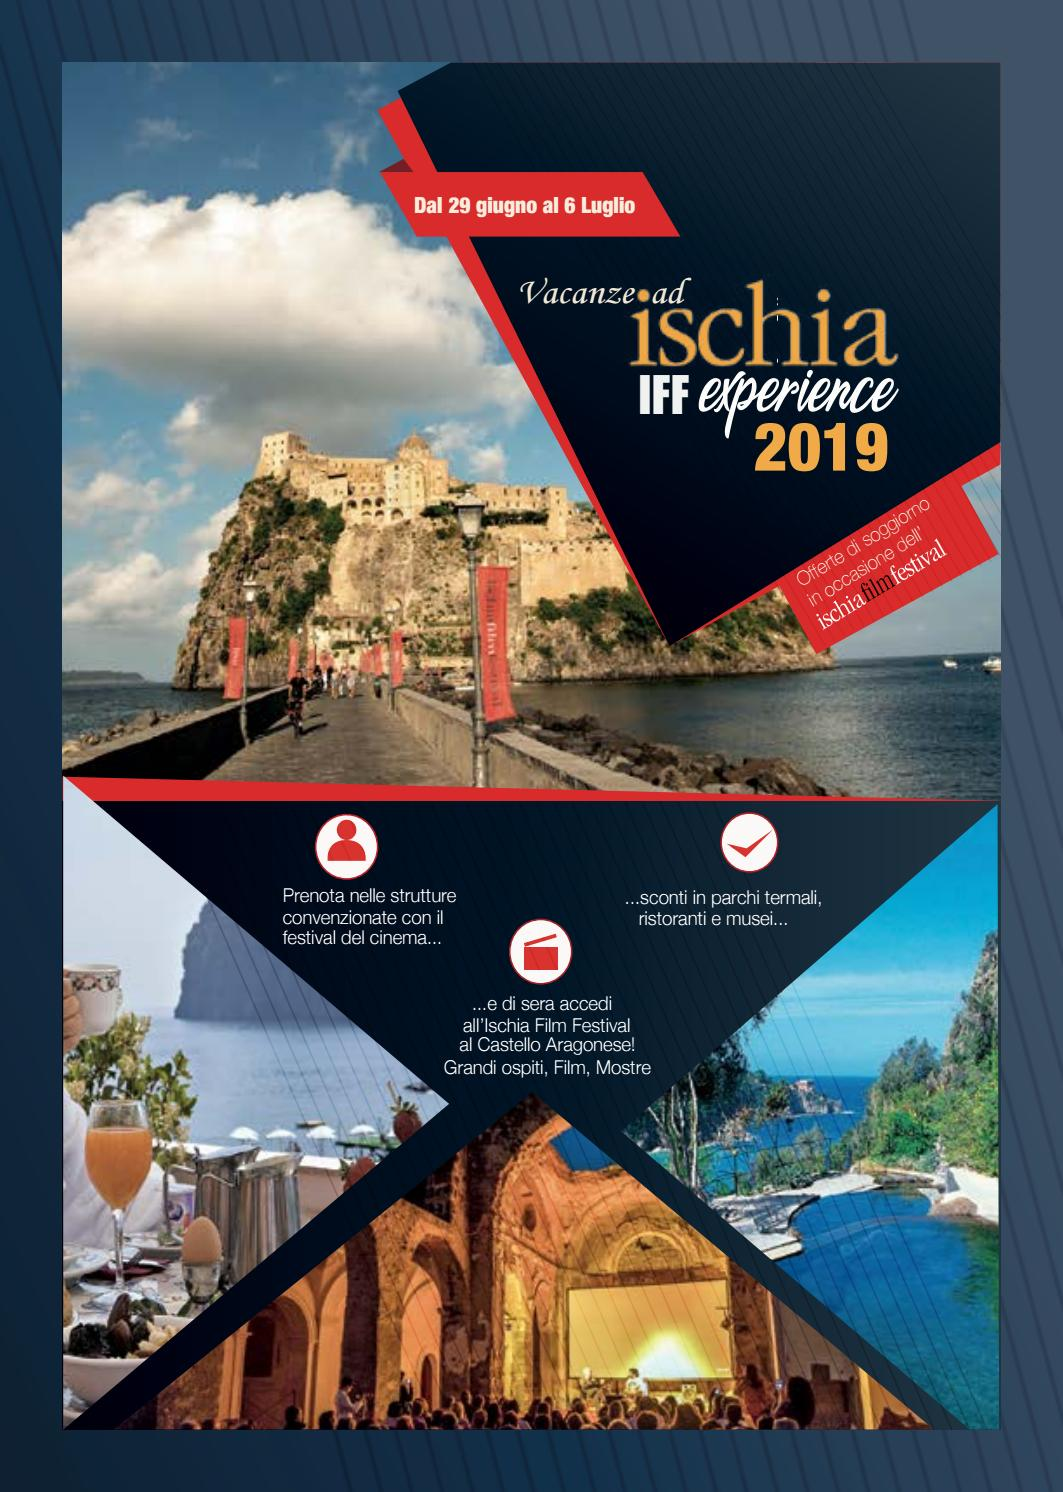 Vacanze ad Ischia 2019 by Ass. Cult. Art Movie e Music - issuu